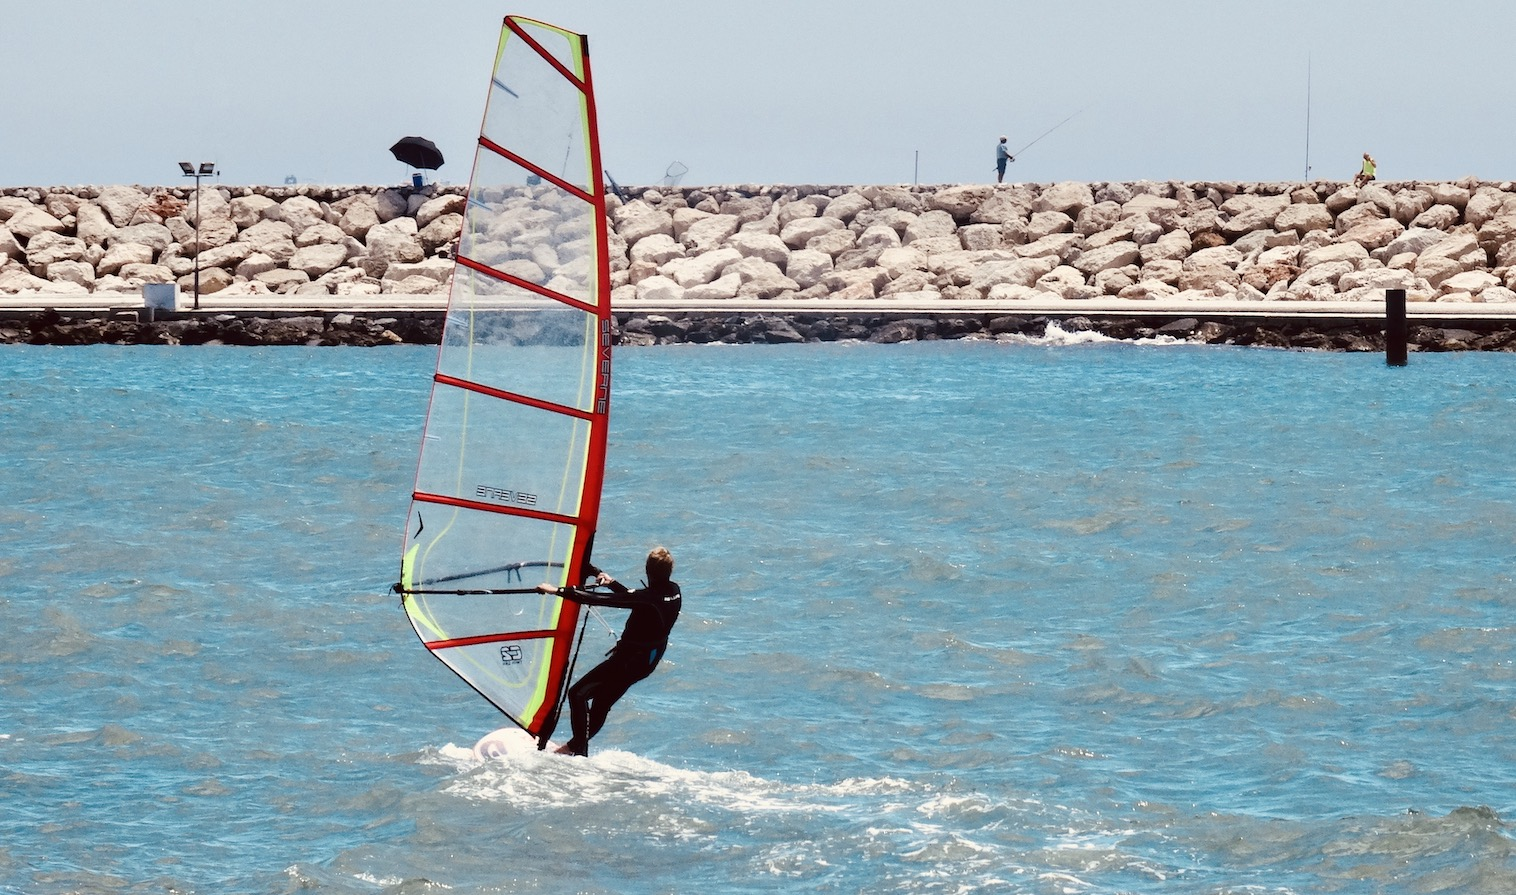 Water sports in Benalmadena.